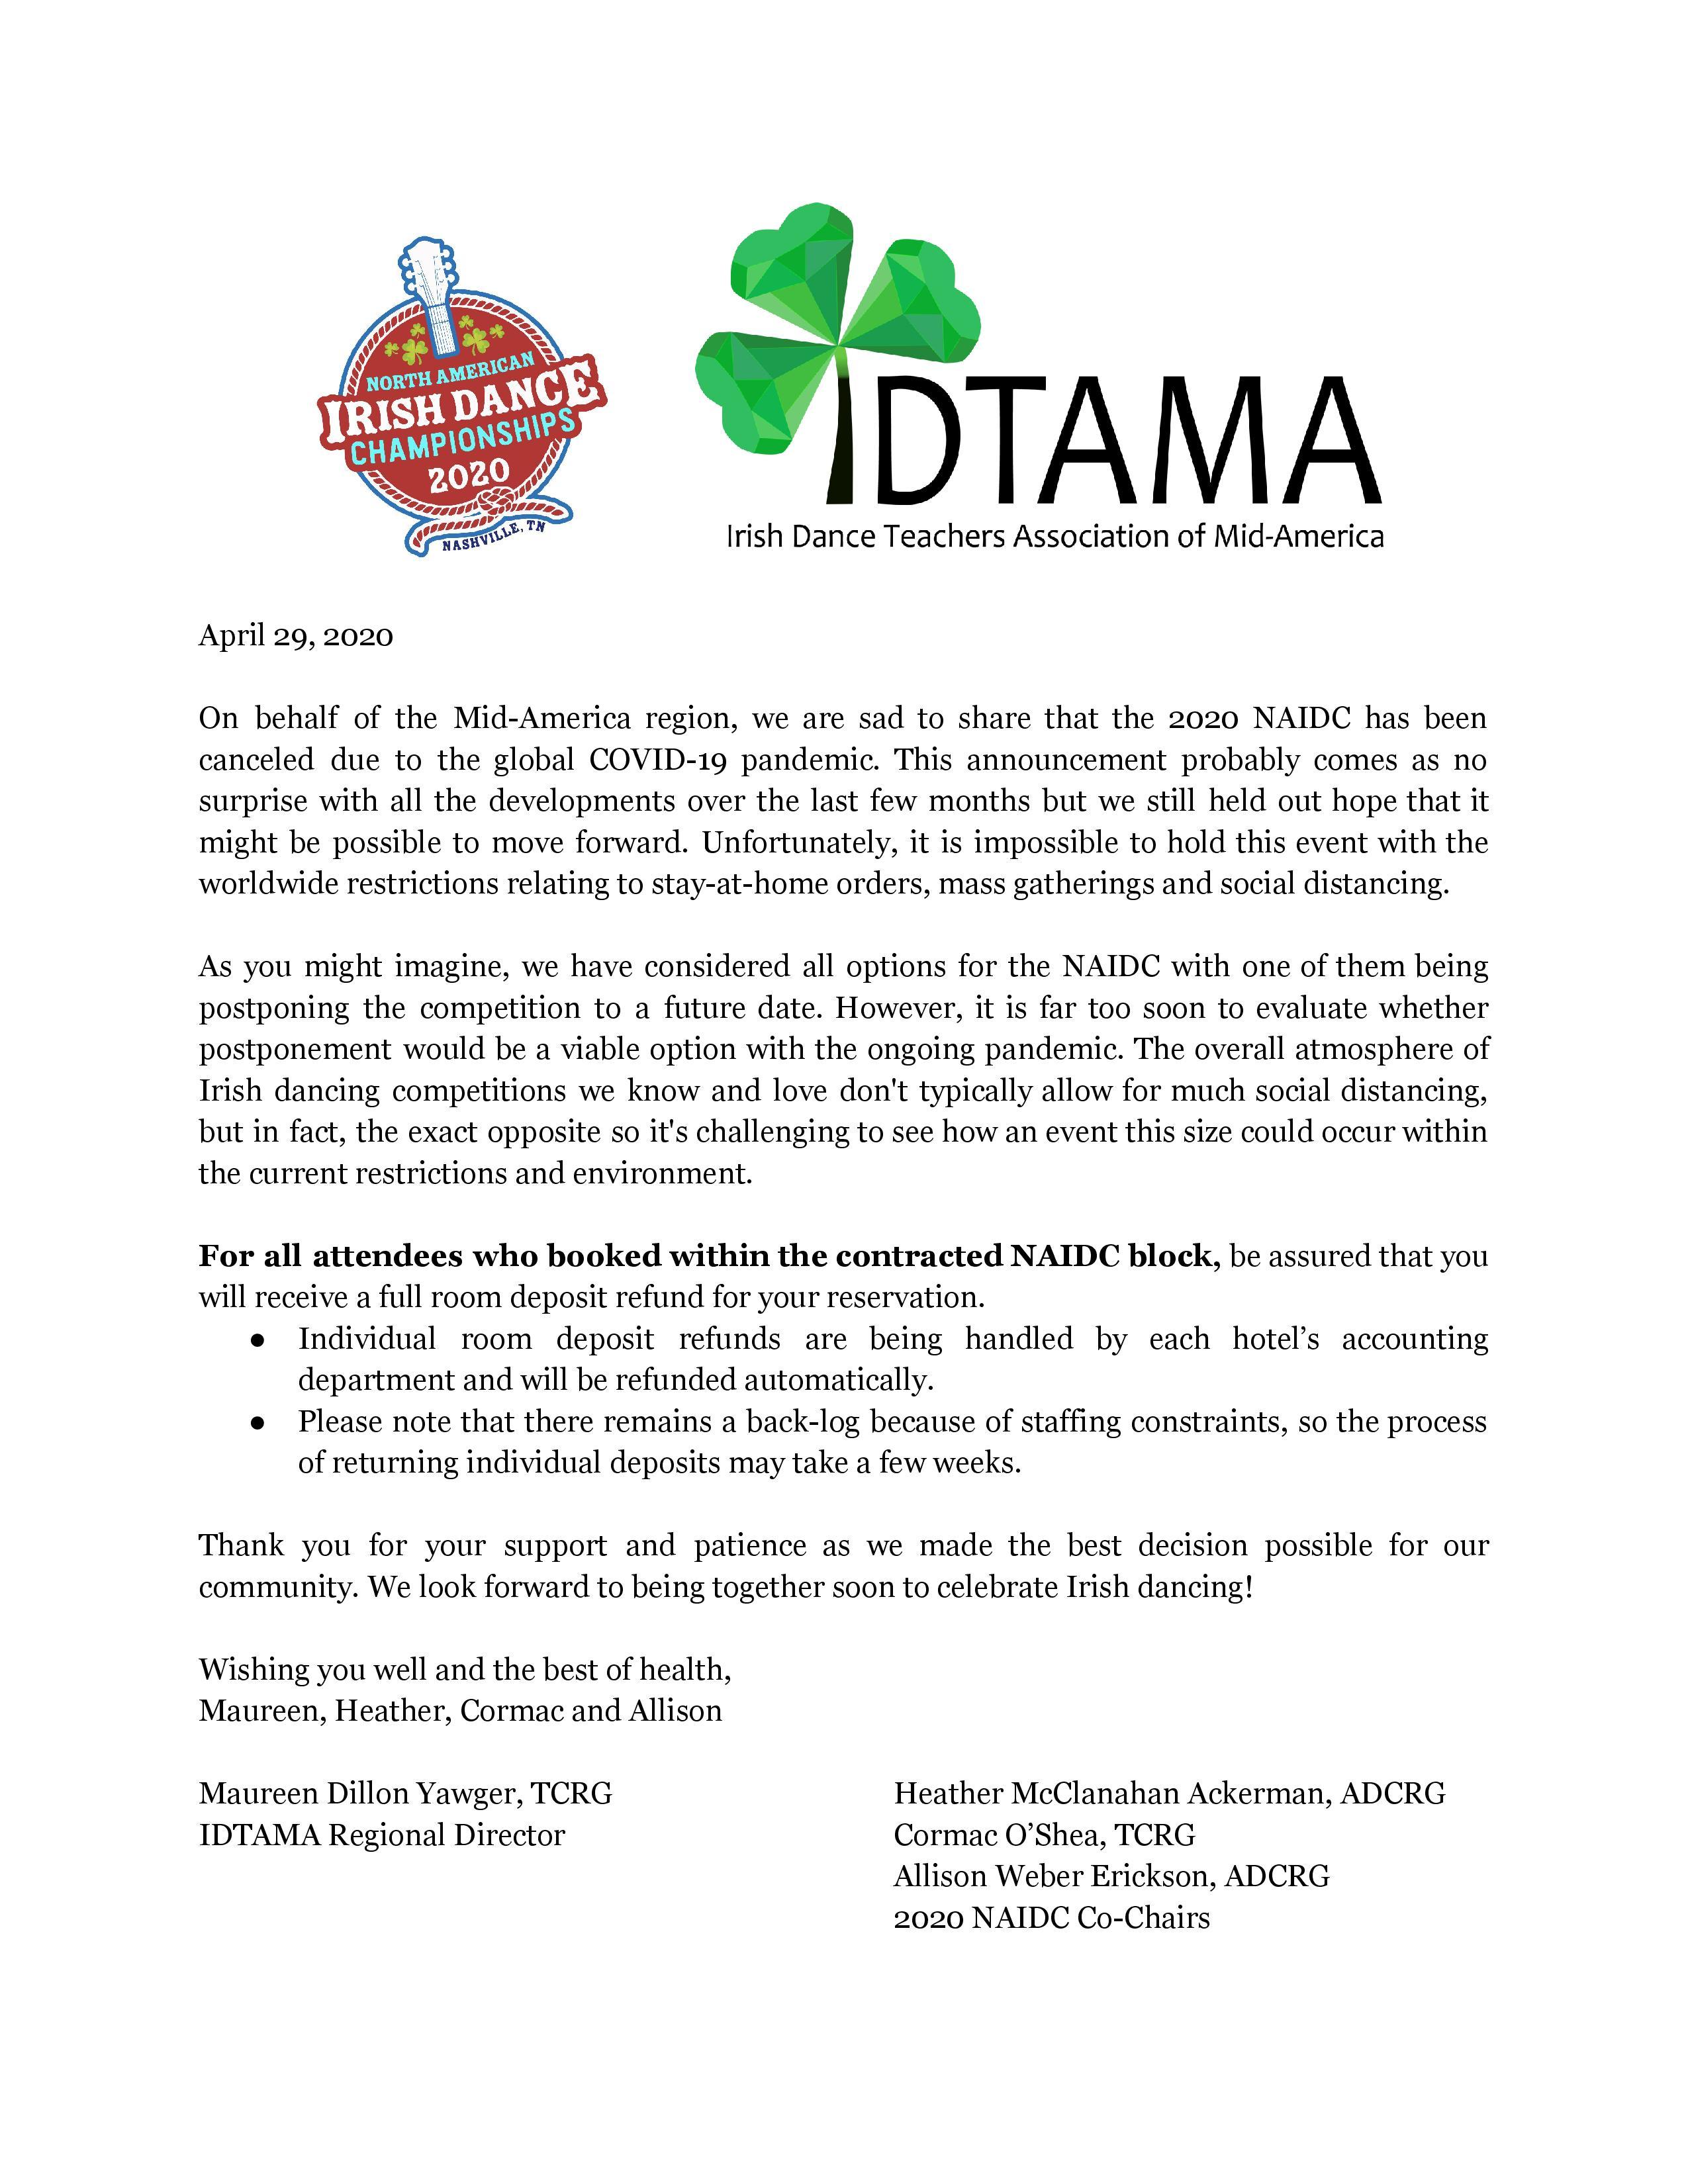 2020 NAIDC Cancellation